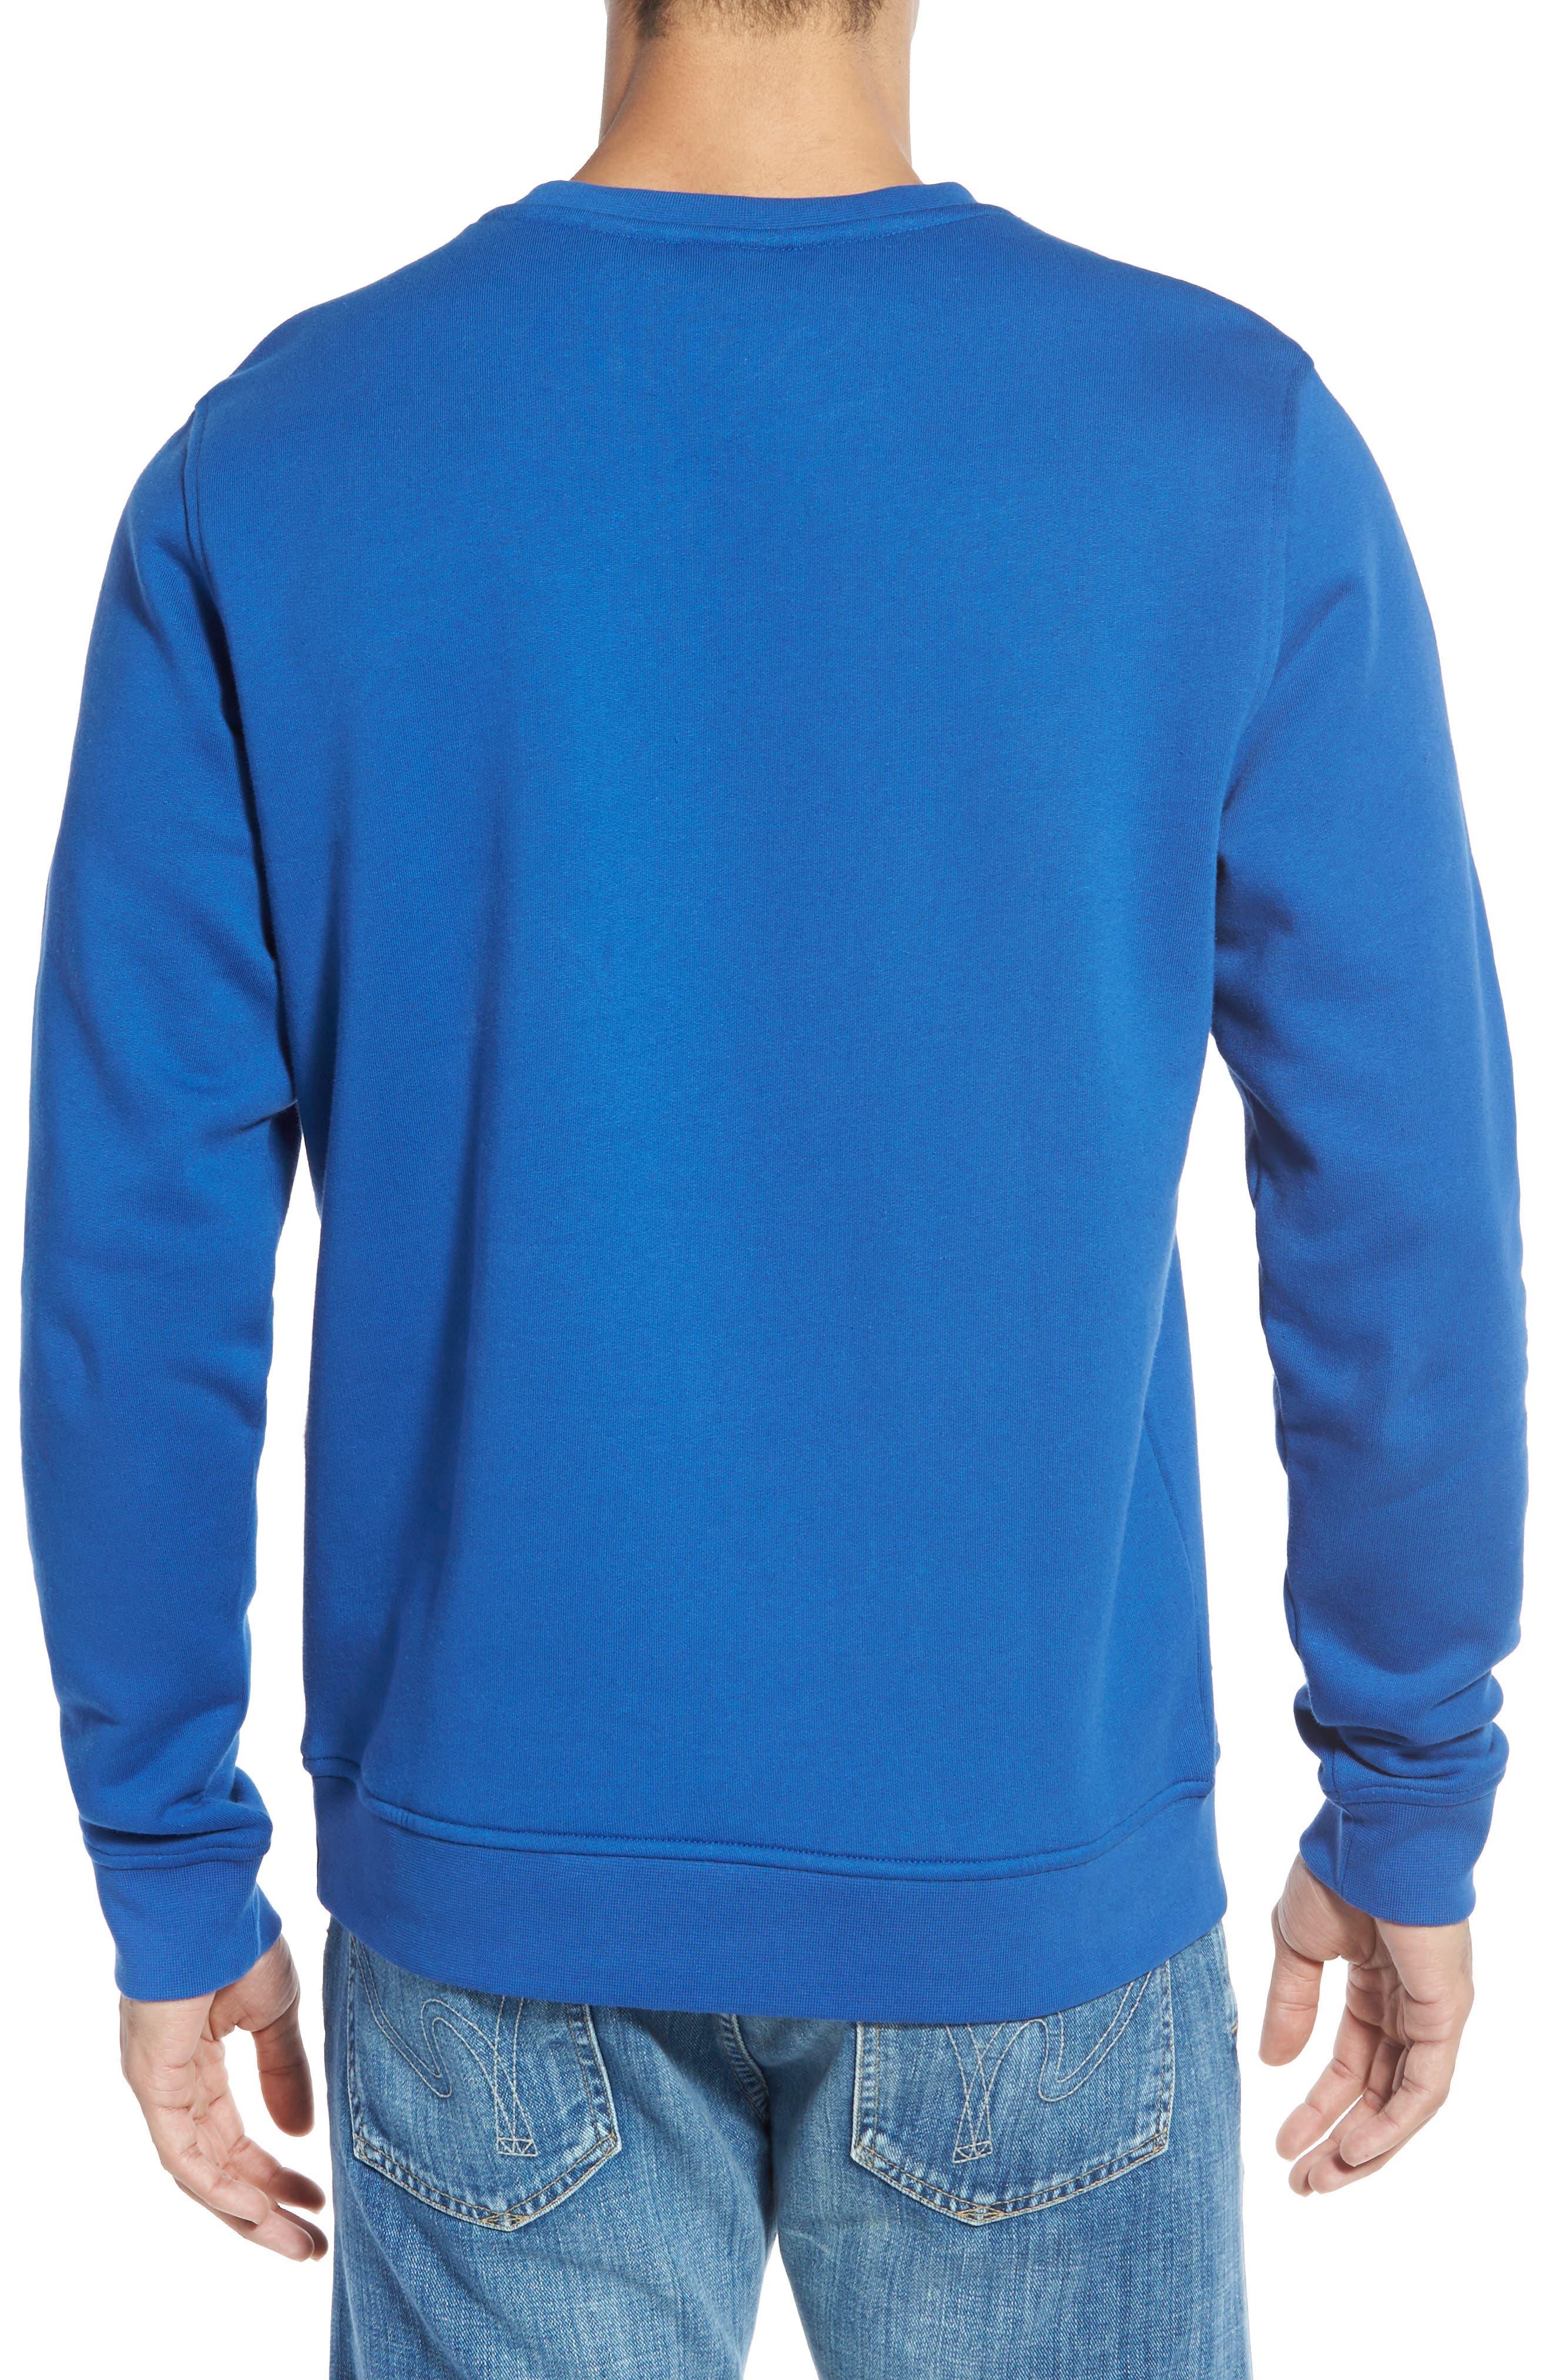 LACOSTE, 'Sport' Crewneck Sweatshirt, Alternate thumbnail 2, color, NAVY